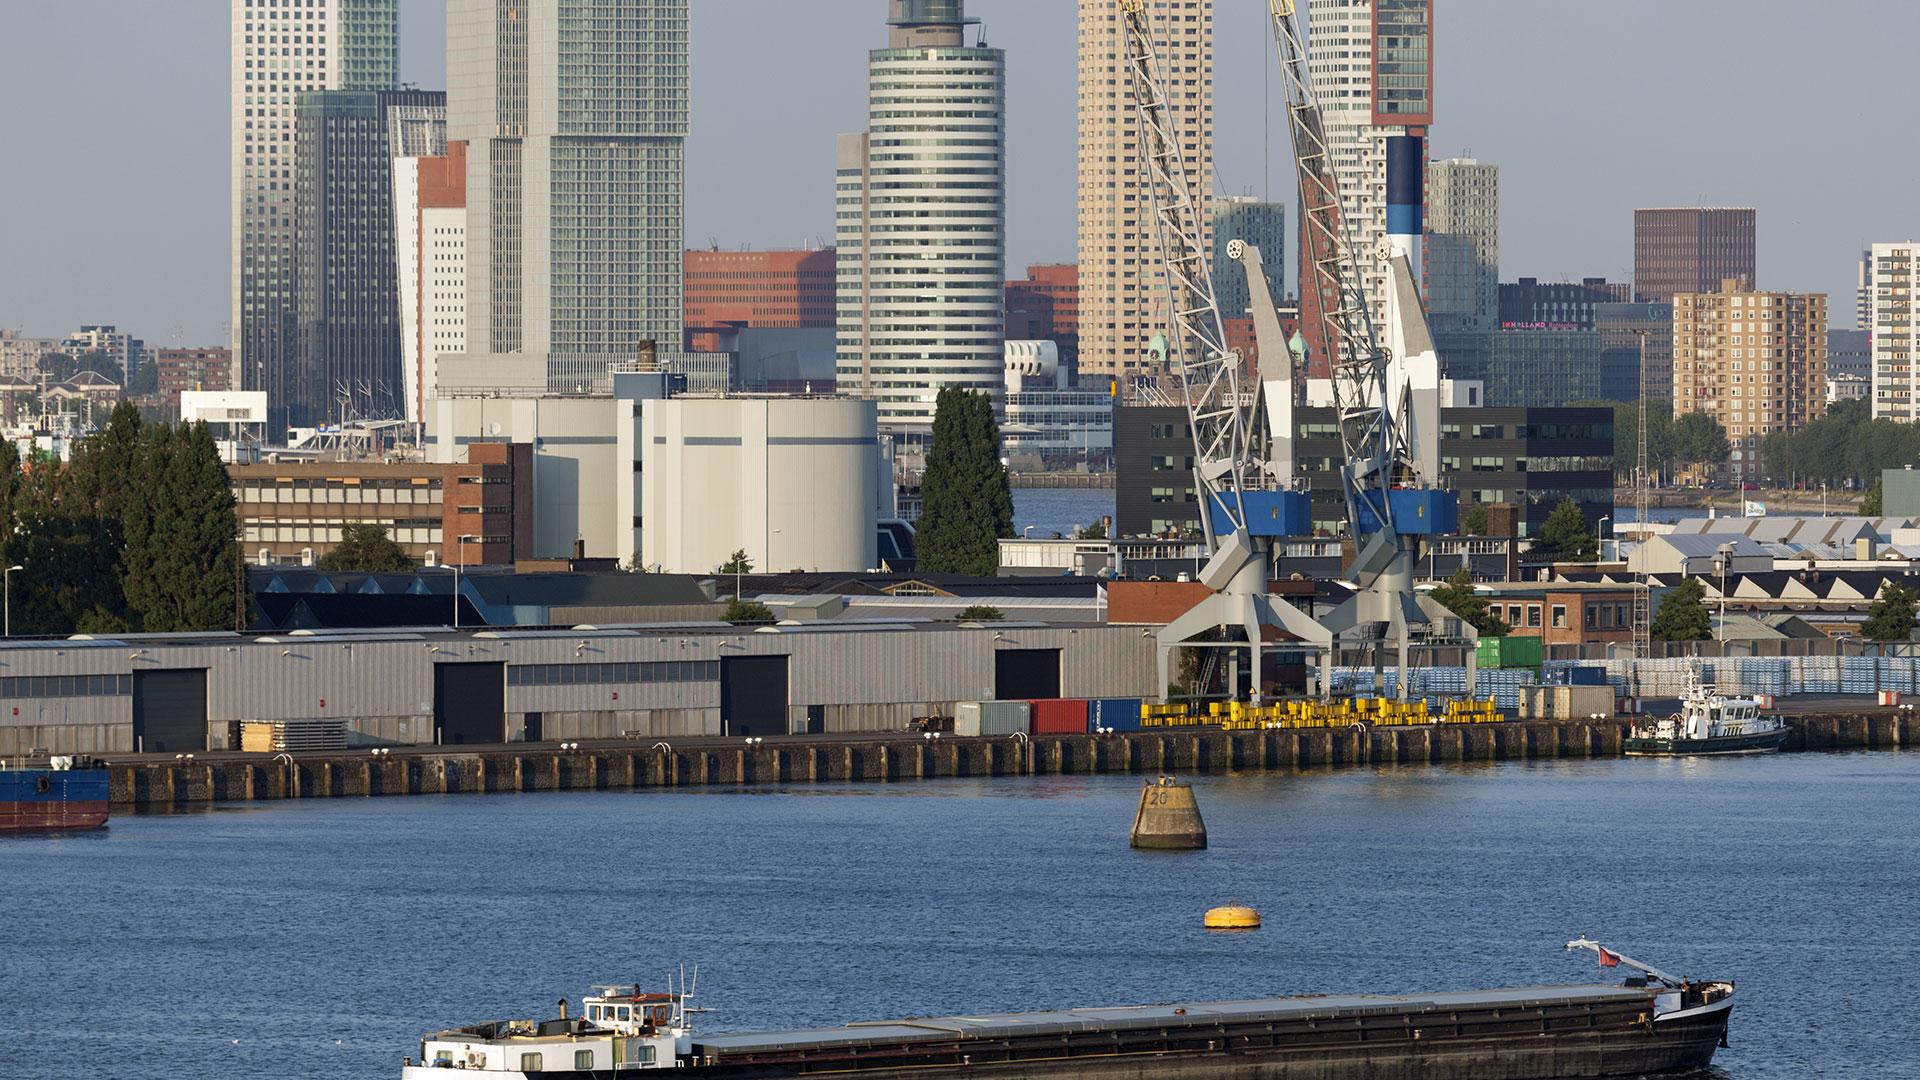 ville-port-rotterdam-carlos-moreno